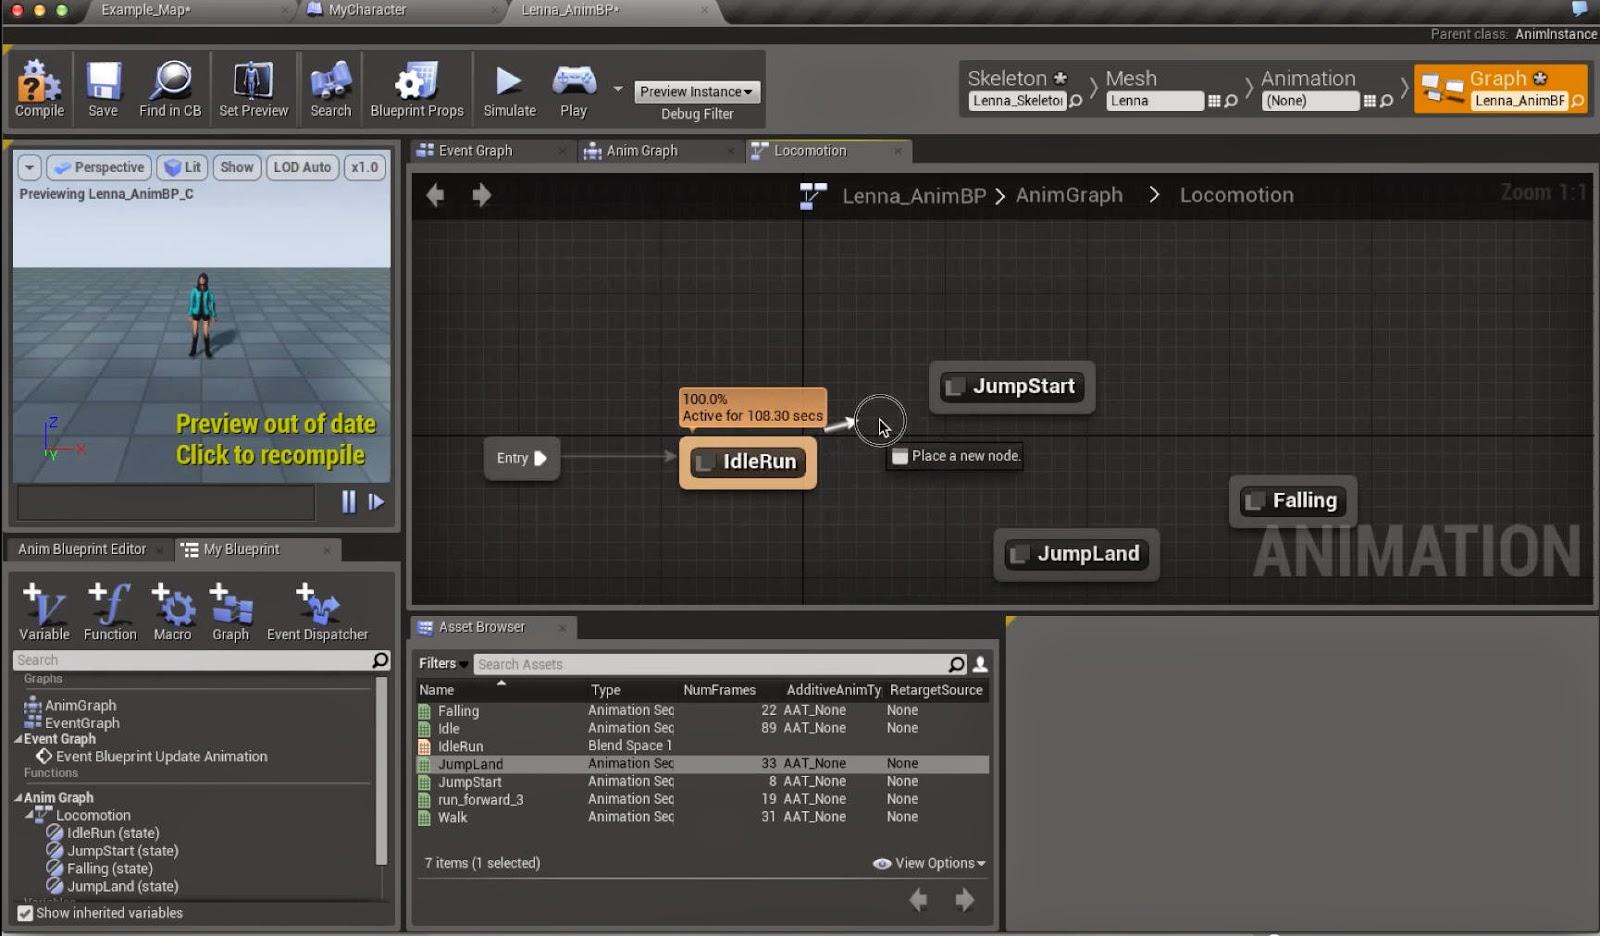 Mixamo to unreal engine 4 workflow cg tutorial mixamo to unreal engine 4 workflow homeanimationrigging malvernweather Choice Image